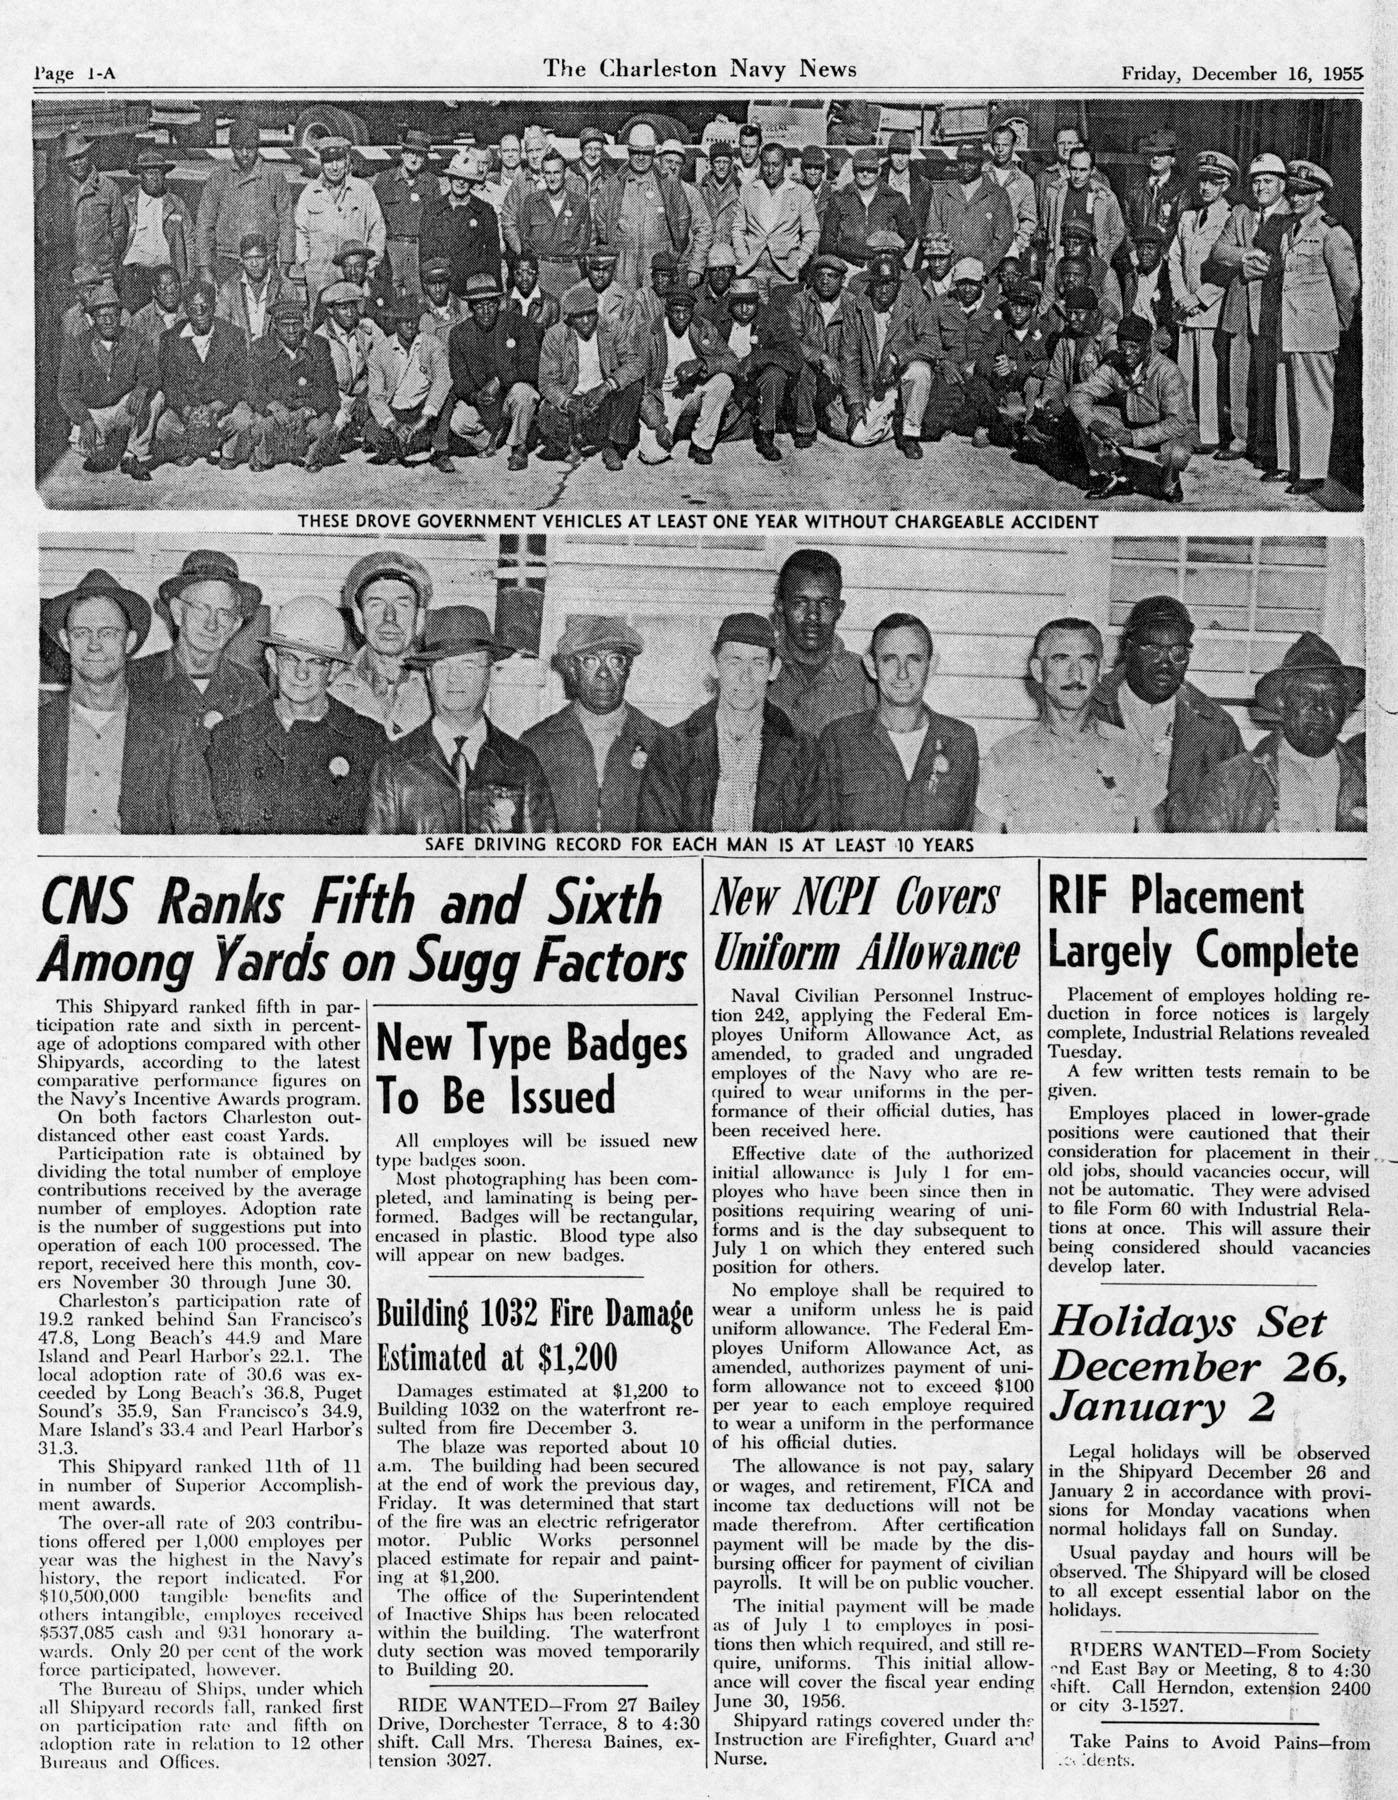 The Charleston Navy News. Volume 14, Edition 11, page ia